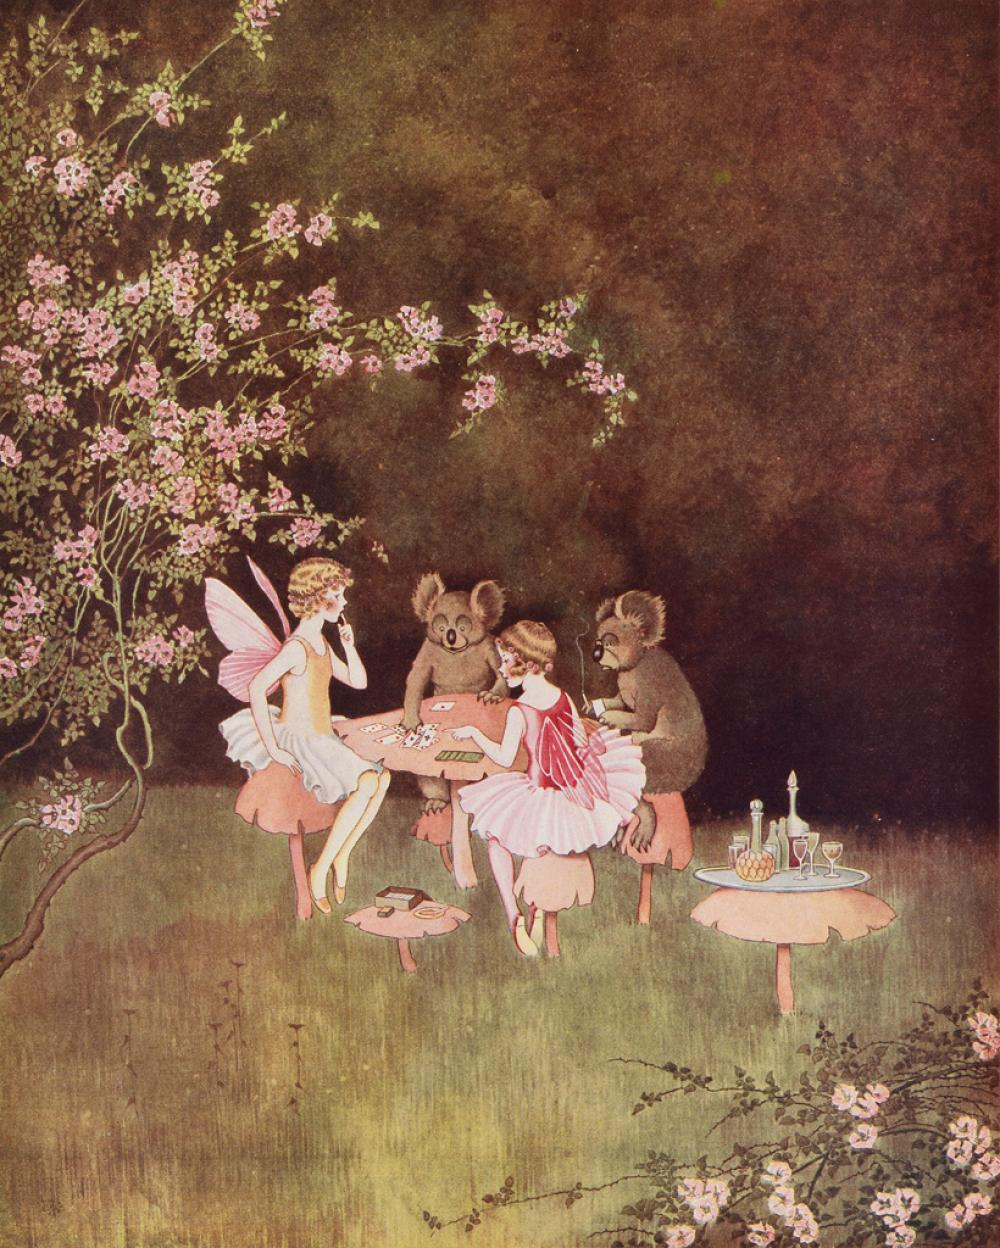 (OUTHWAITE, IDA RENTOUL.) Rentoul, Annie R. and Grenby Outhwaite. Fairyland.